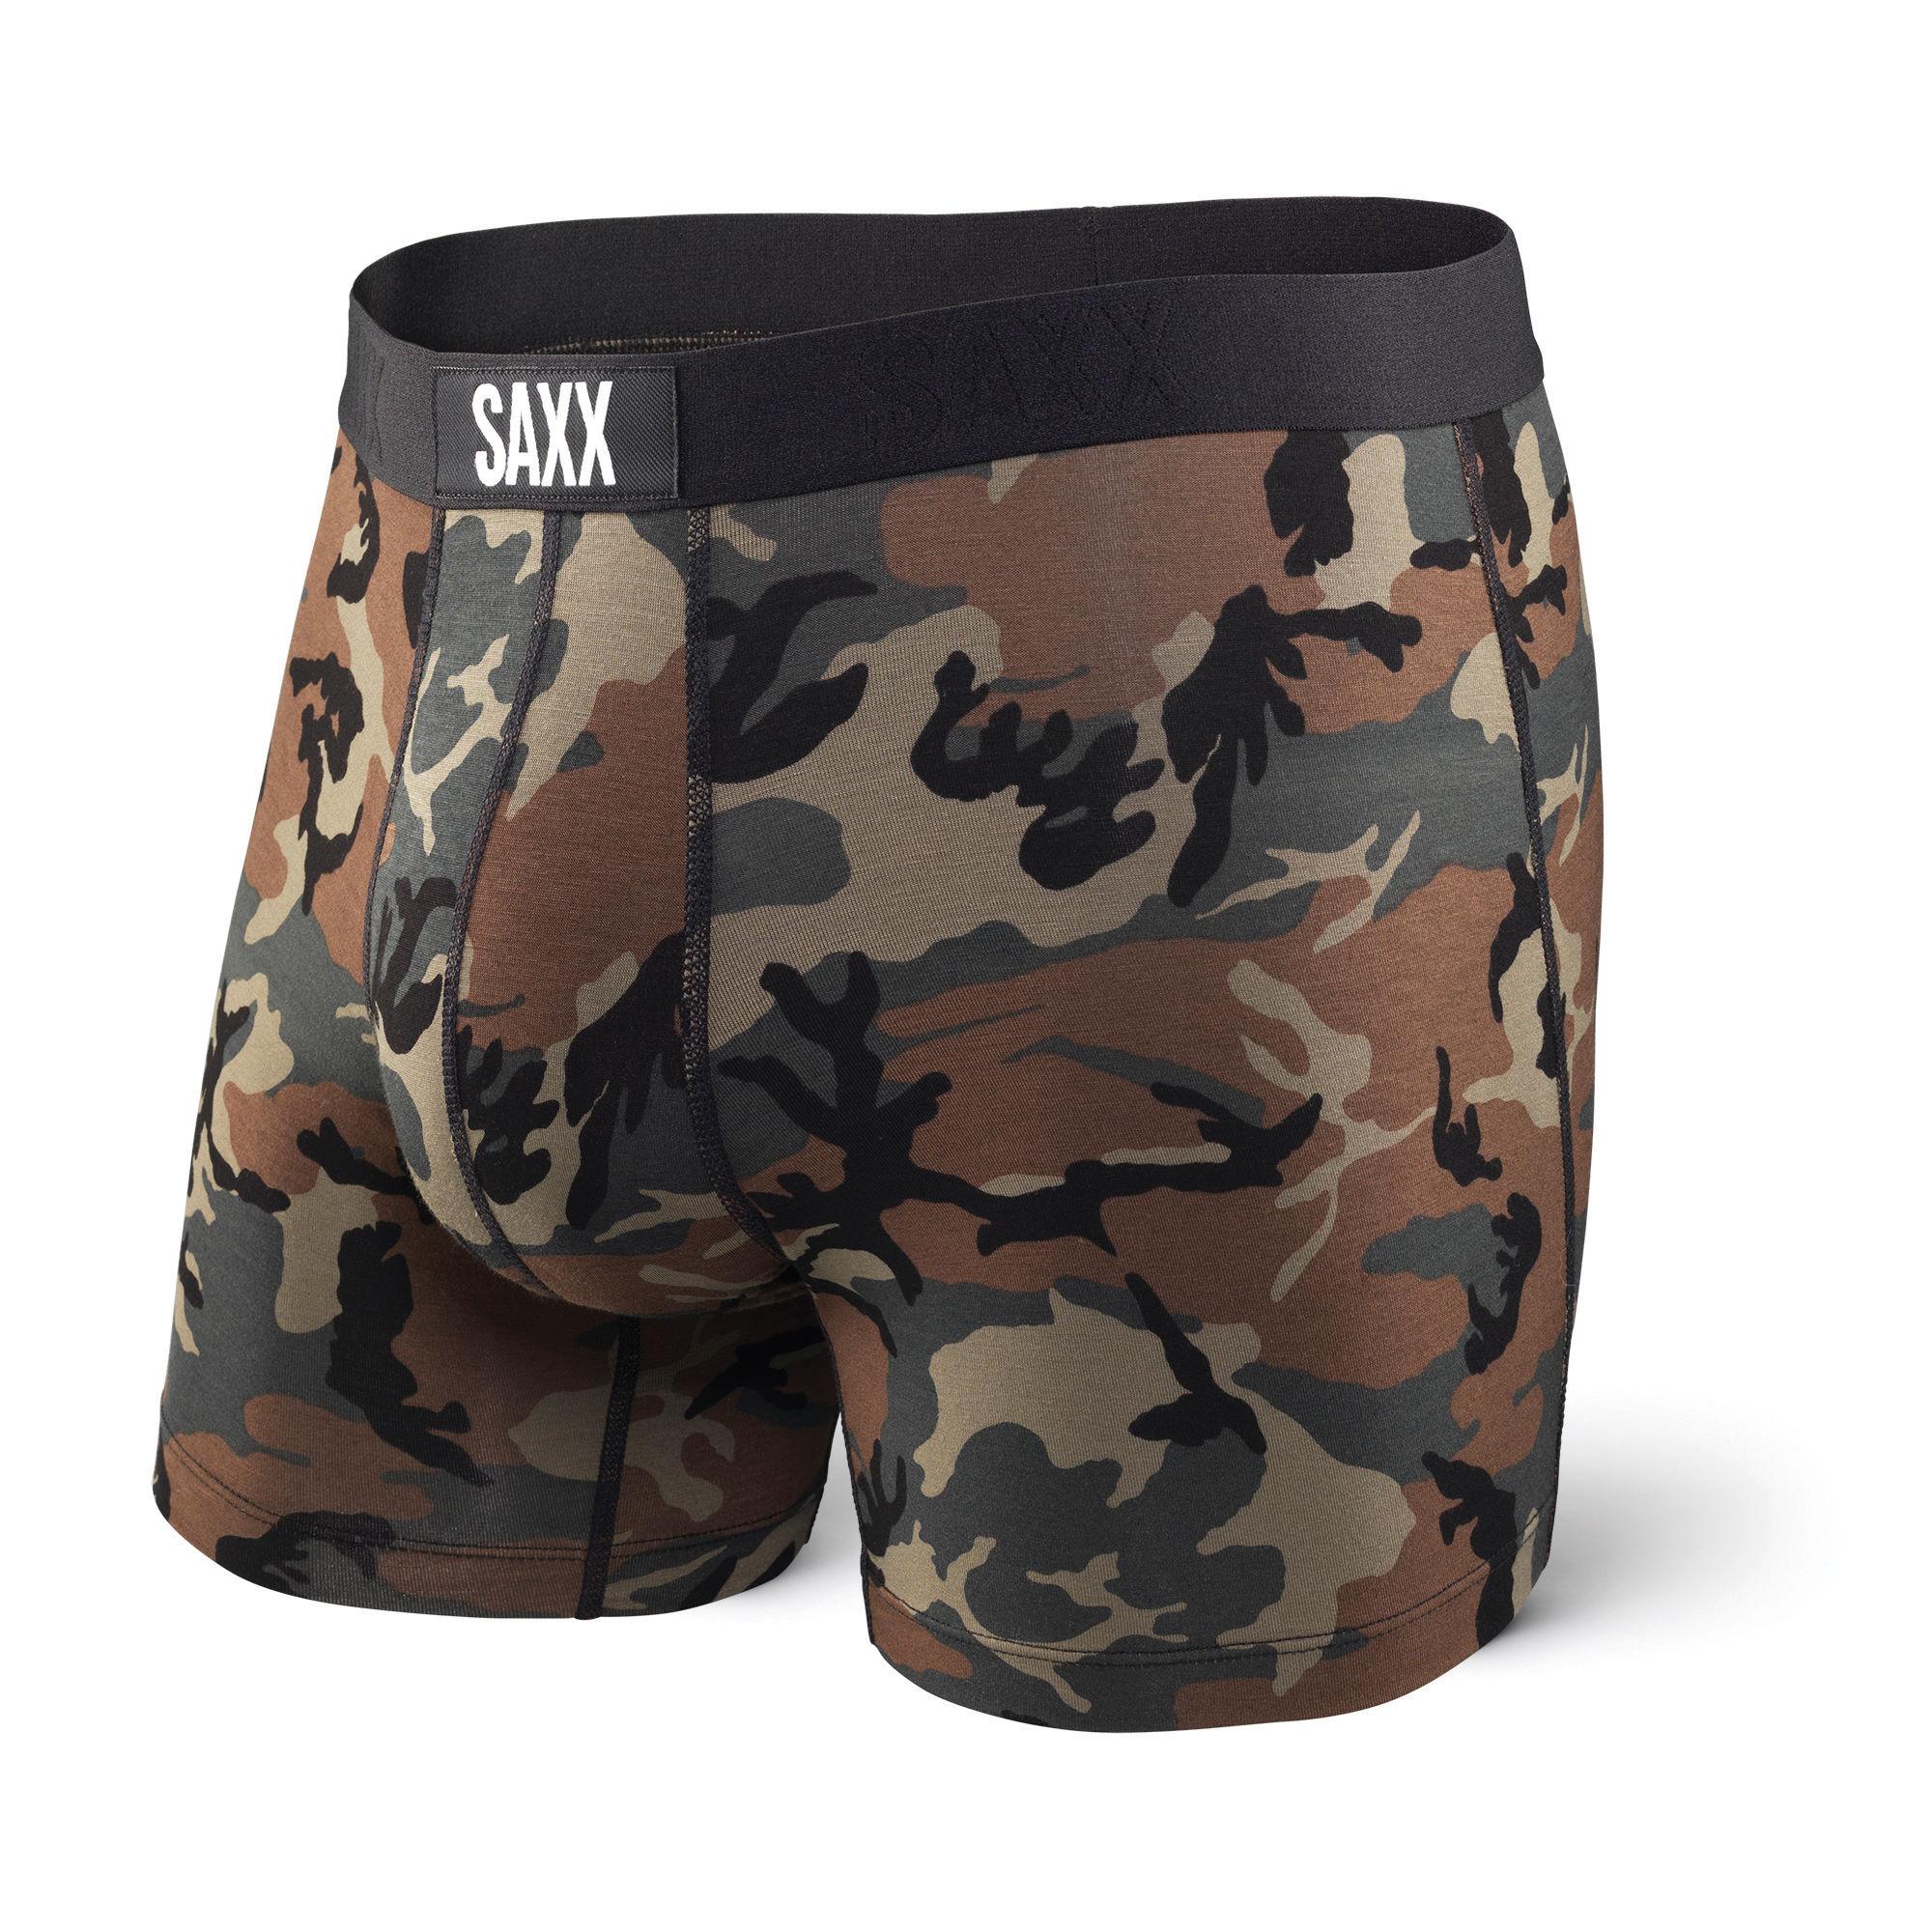 SAXX Vibe Everyday Boxer Brief Woodland Camo